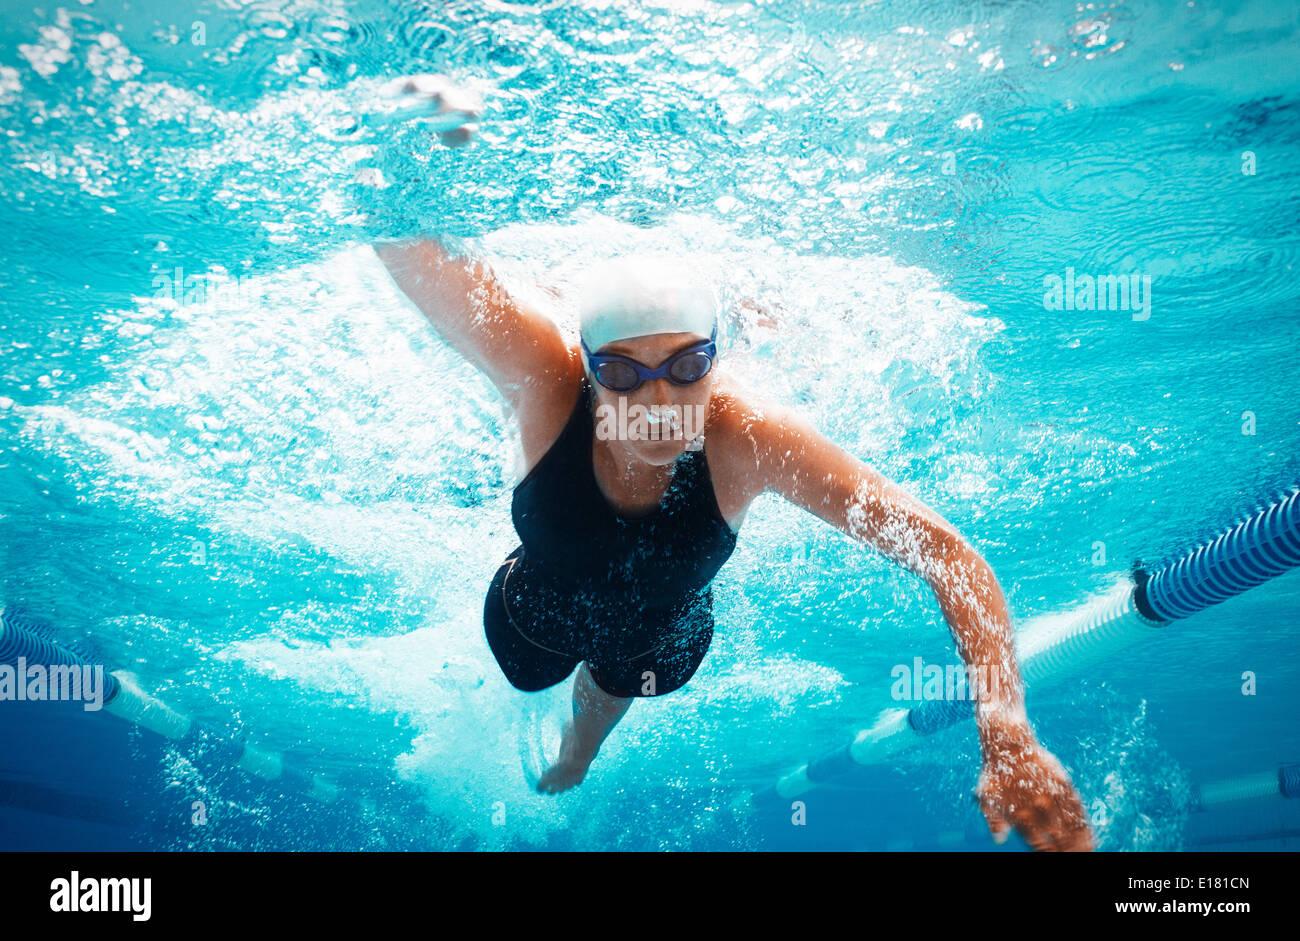 Nuotatore racing in piscina Immagini Stock